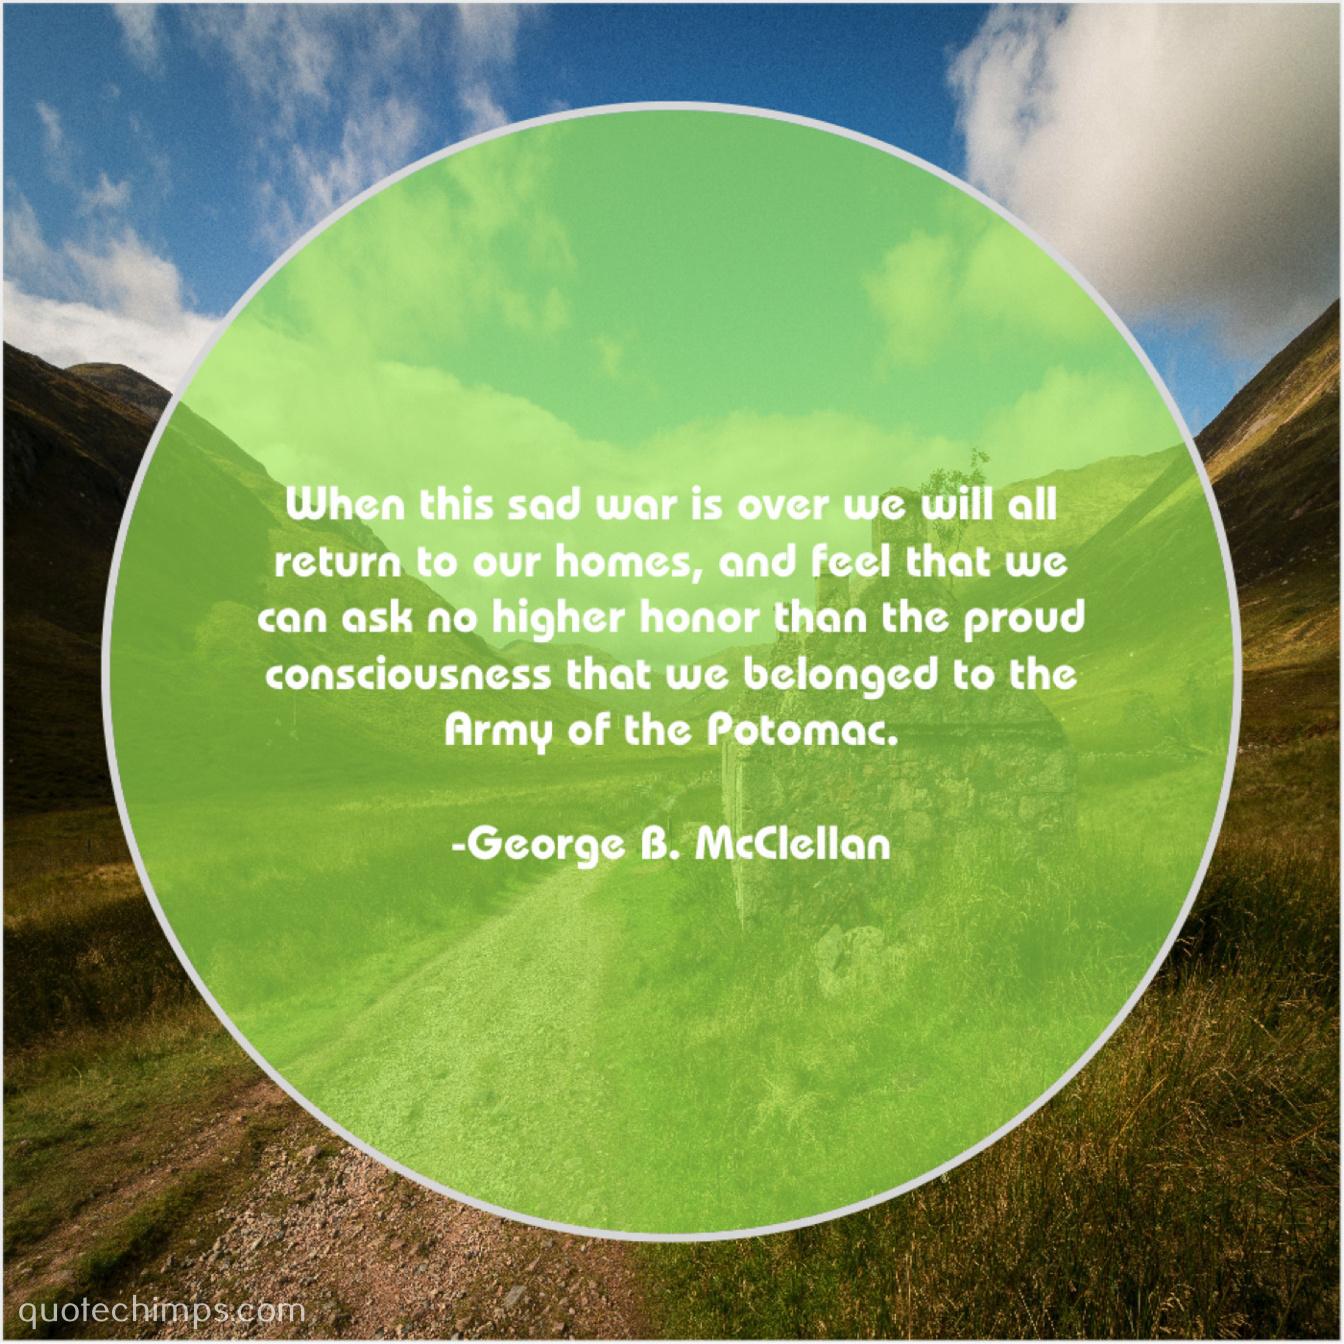 George B  McClellan | | Quote Chimps